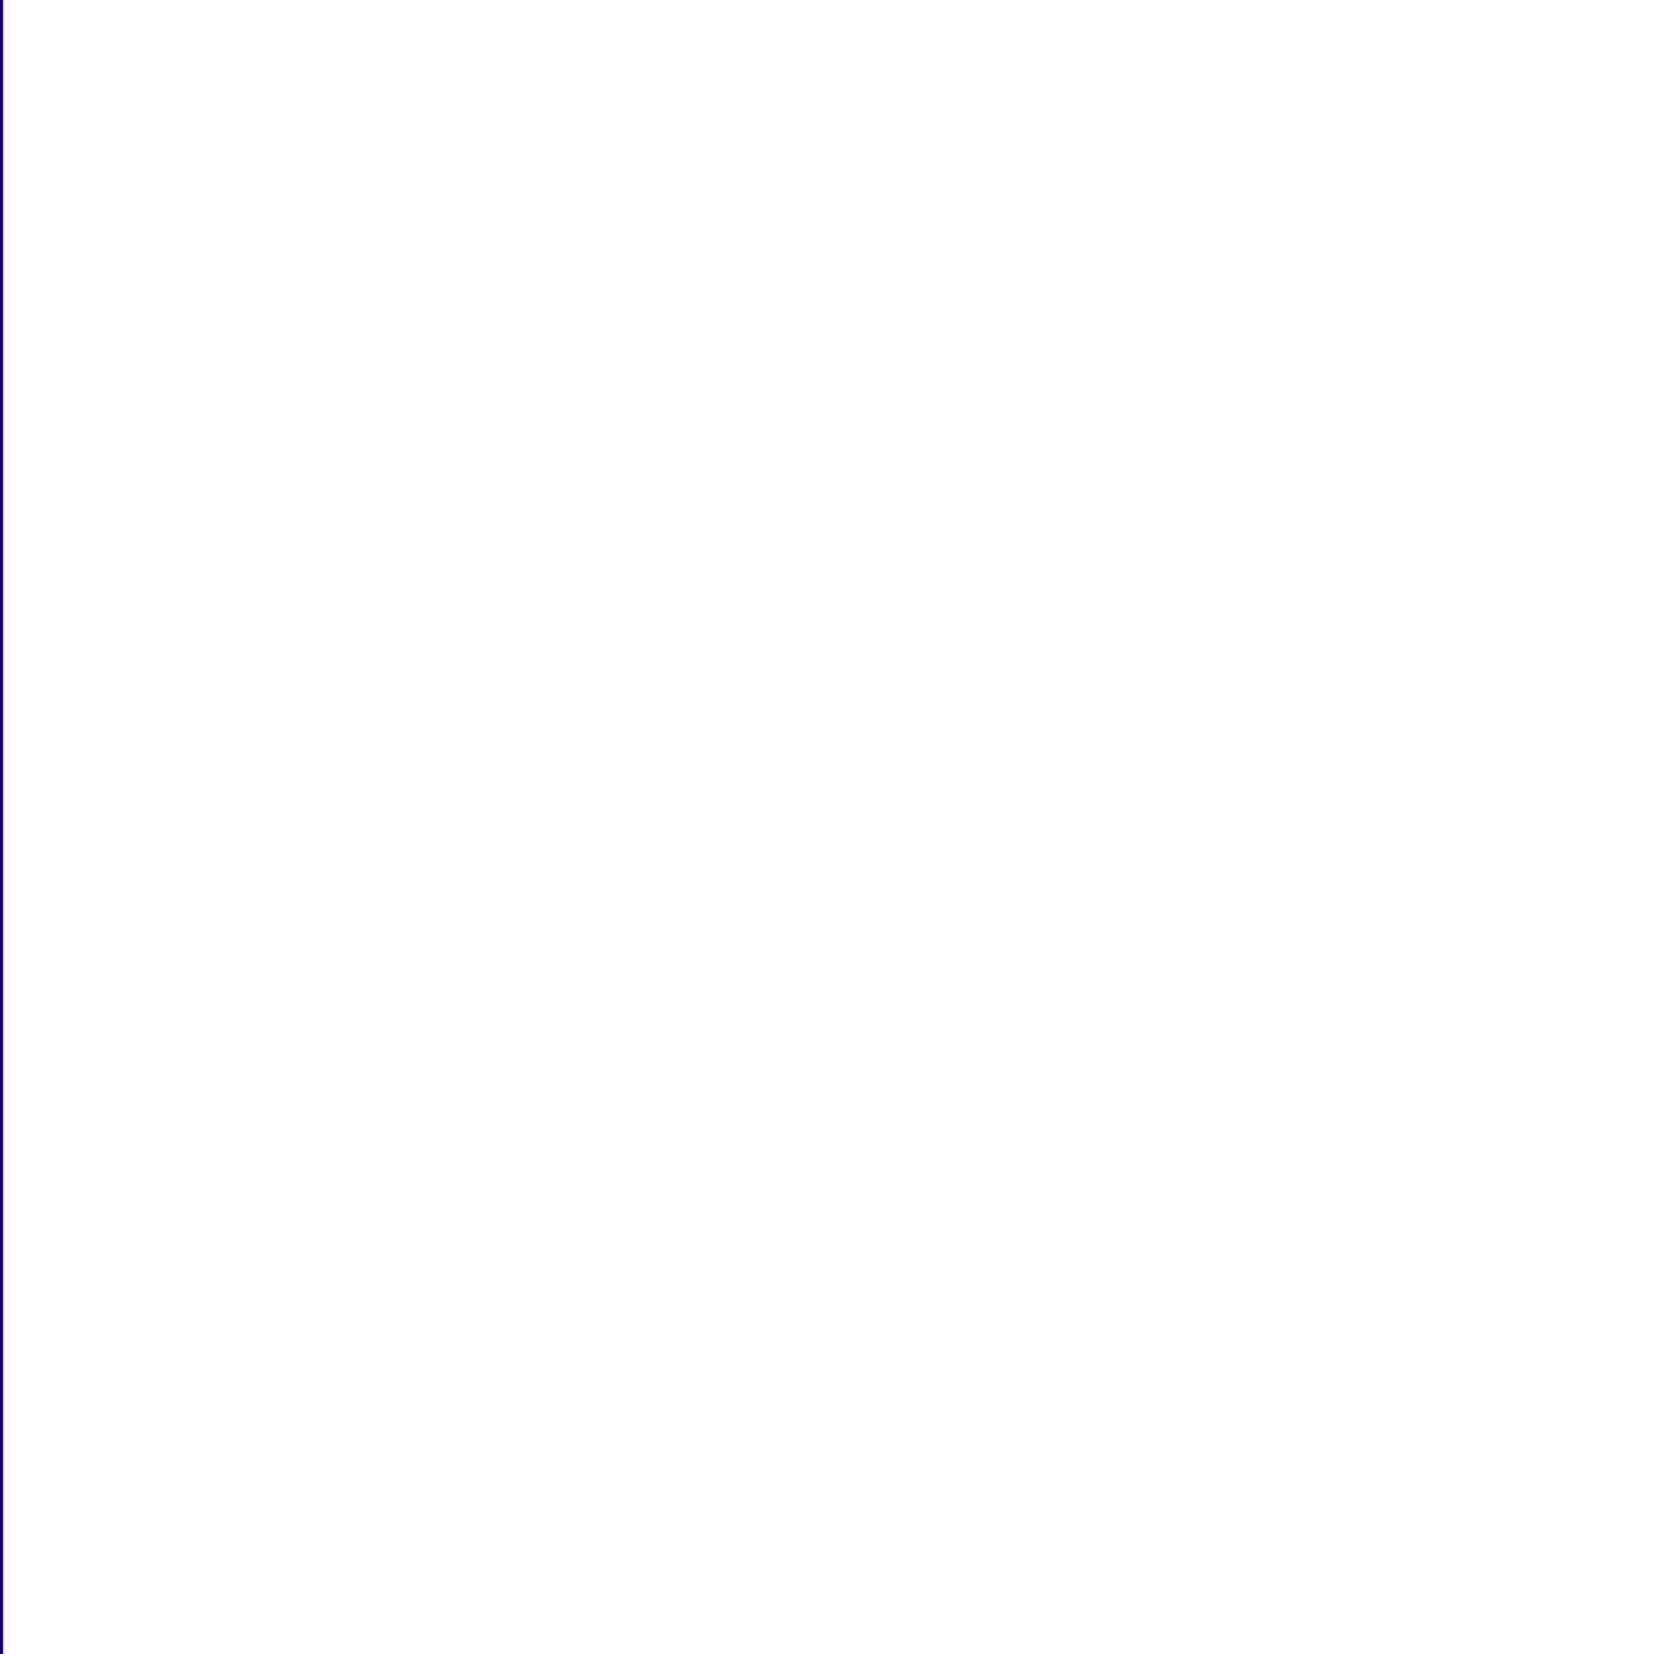 https://www.jib.gr/wp-content/uploads/2020/09/OPTIMA-BANK-BOOKLET-WEB_Page_101.jpg